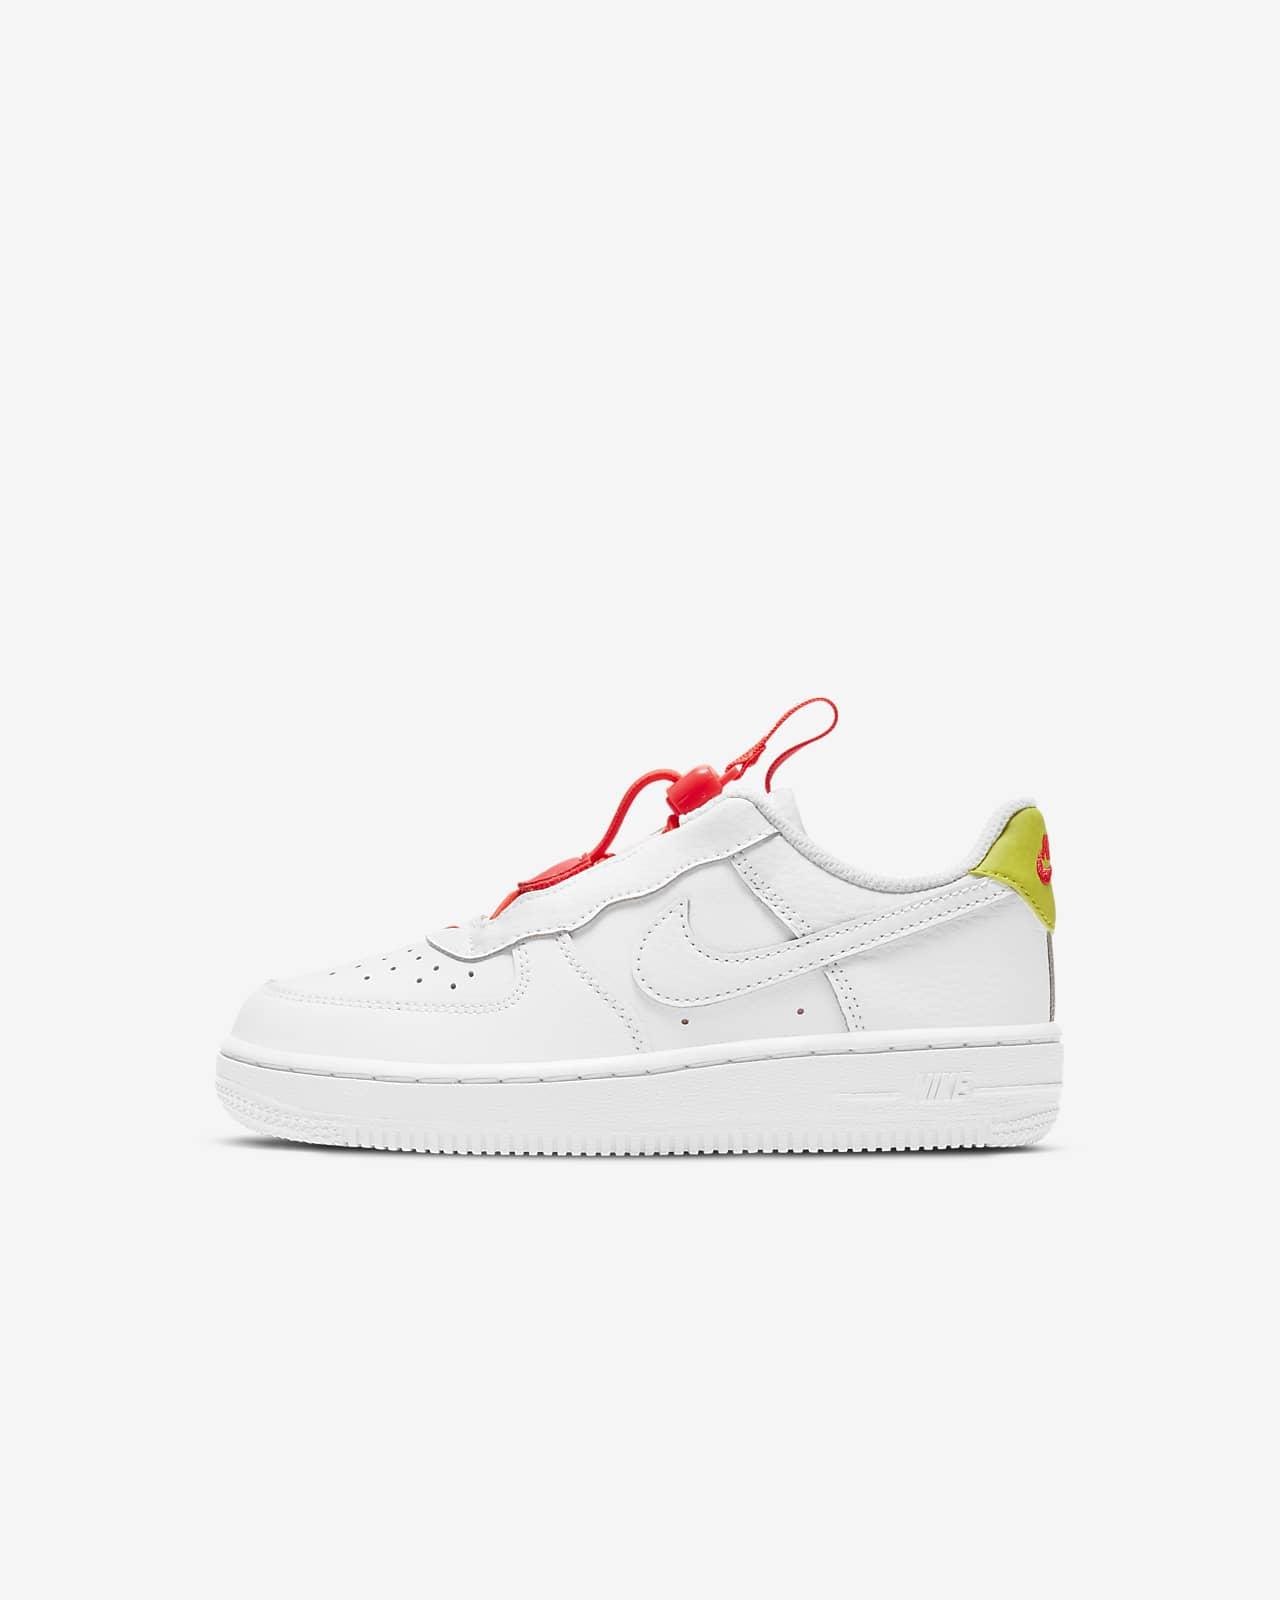 Chaussure Nike Force 1 Toggle pour Jeune enfant